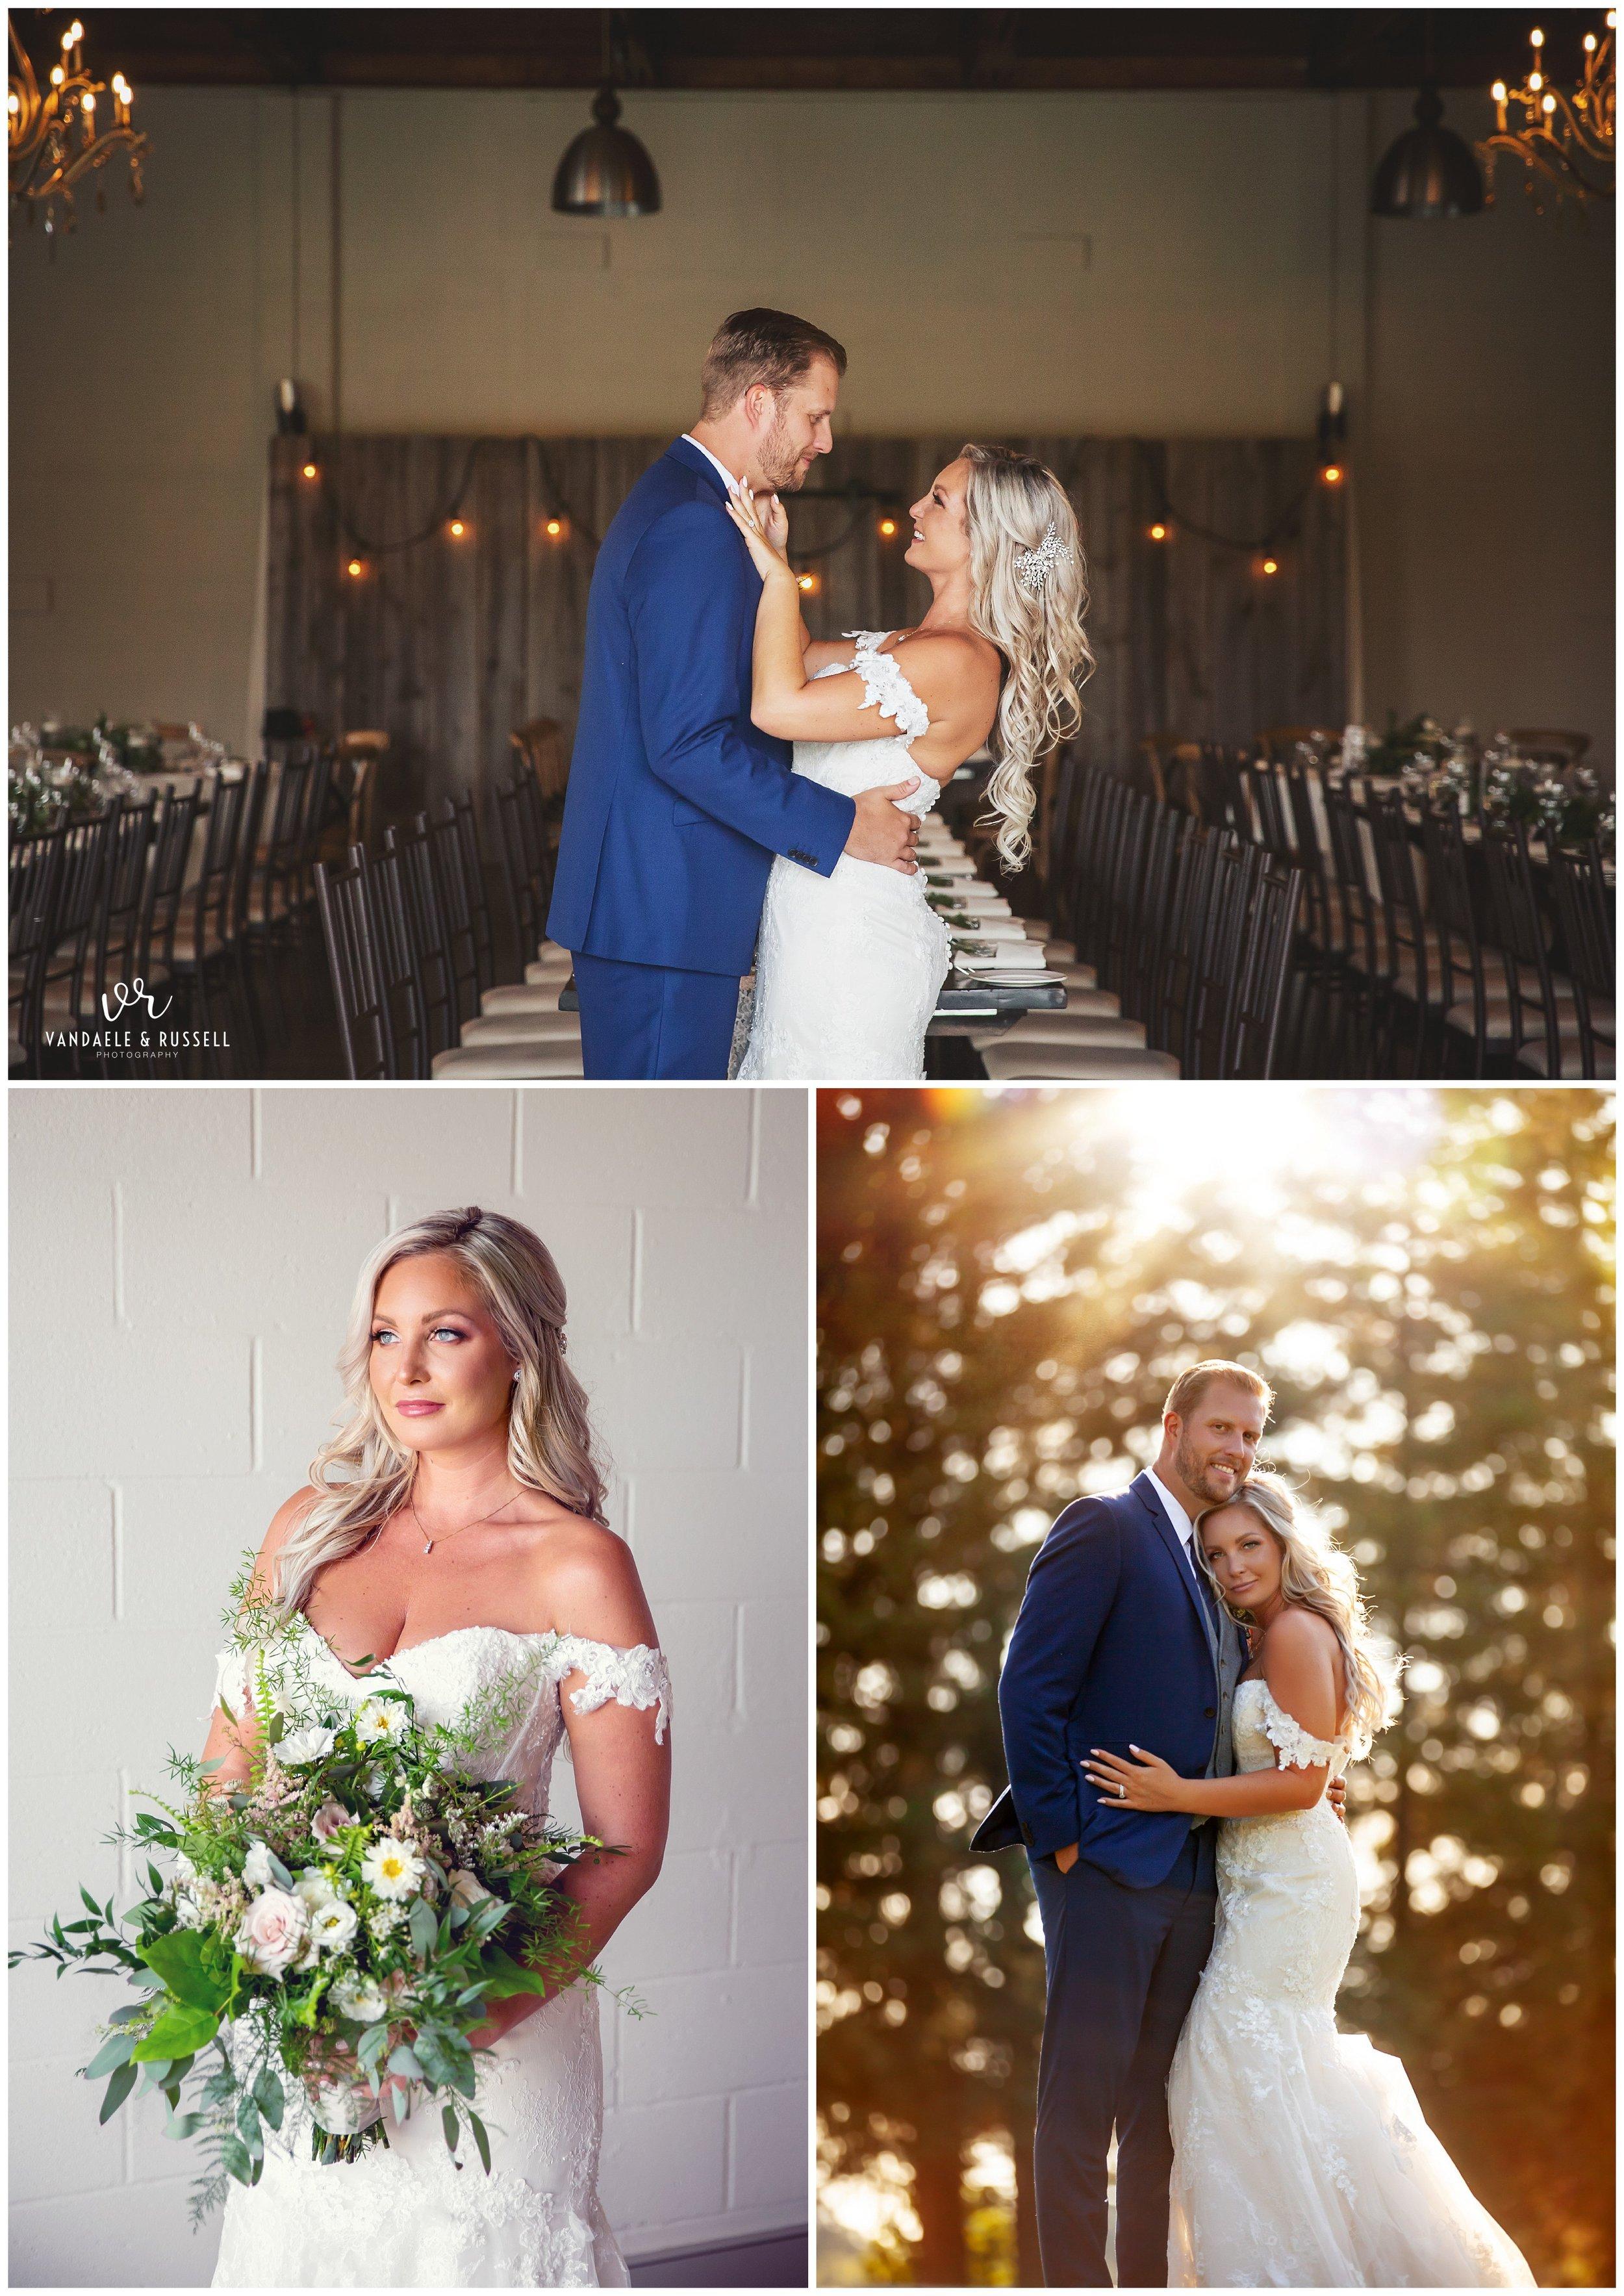 VanDaele-Russell-Wedding-Photography-London-Toronto-Ontario_0159.jpg